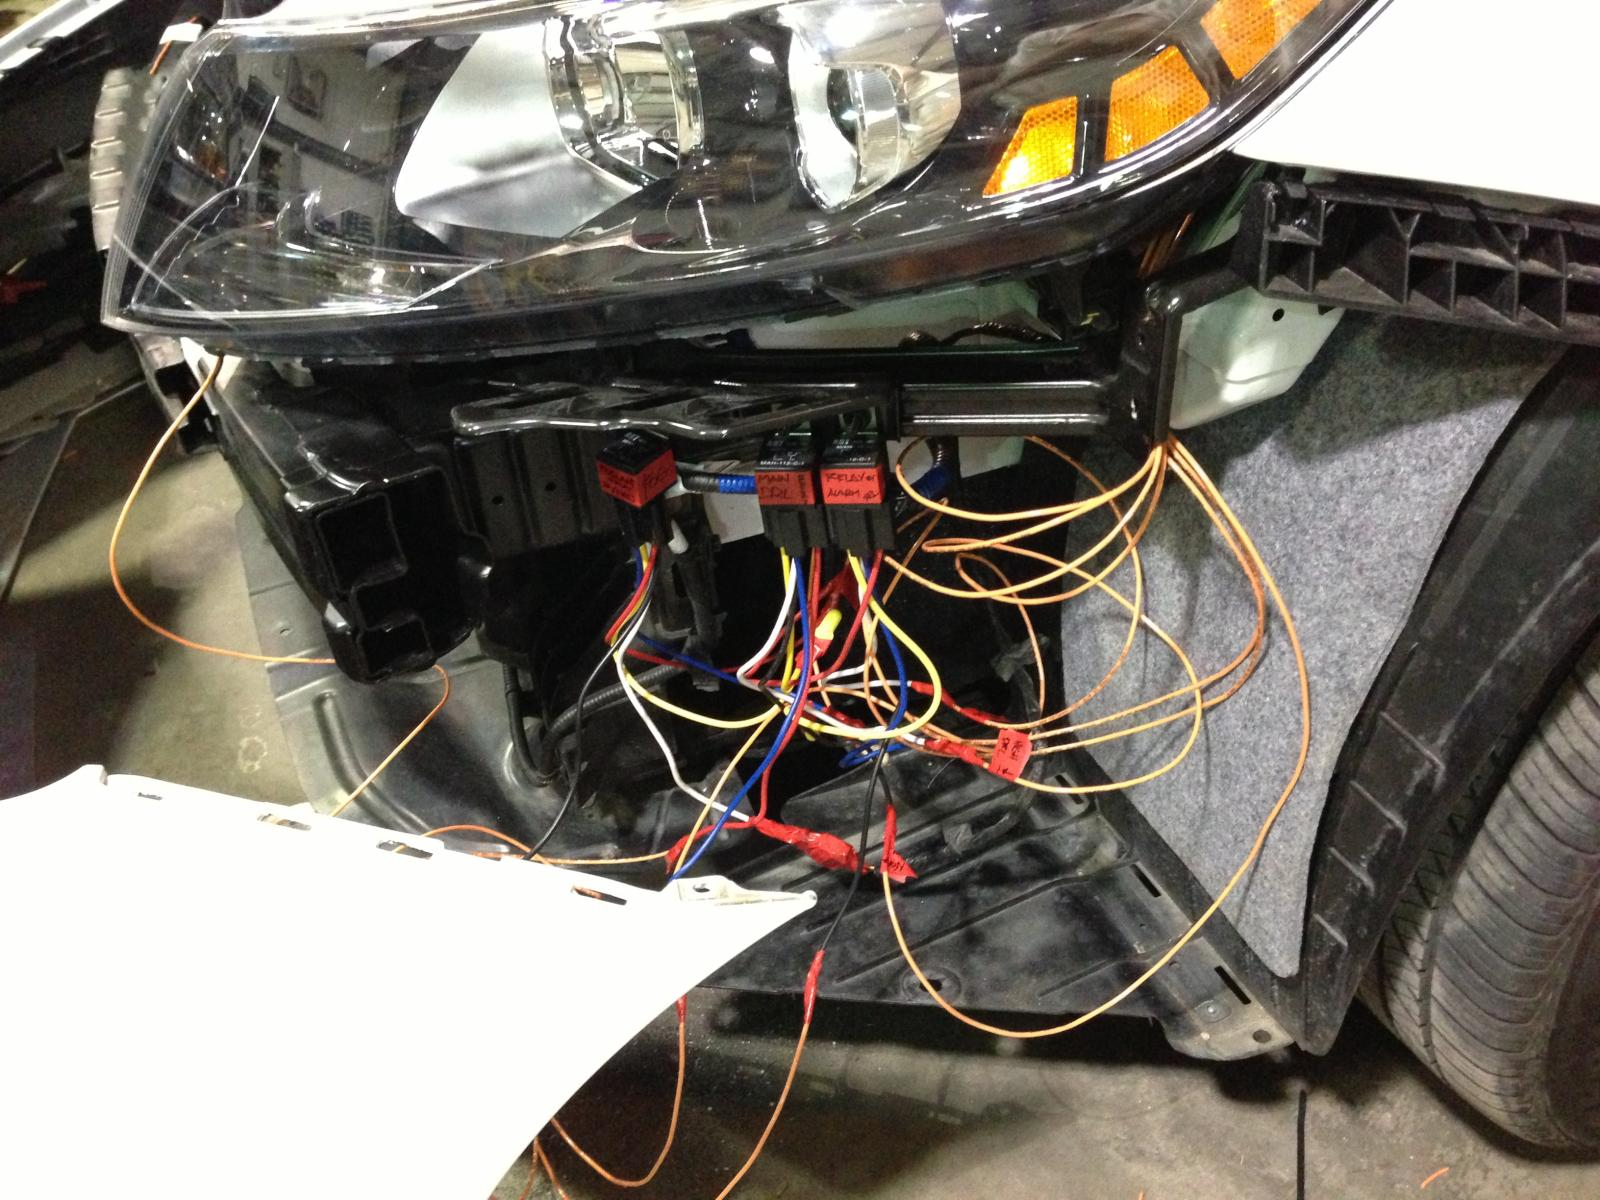 simple wiring diagram to bypass foglights (works w/o headlights or w/  highbeams) | kia optima forums  kia optima forums